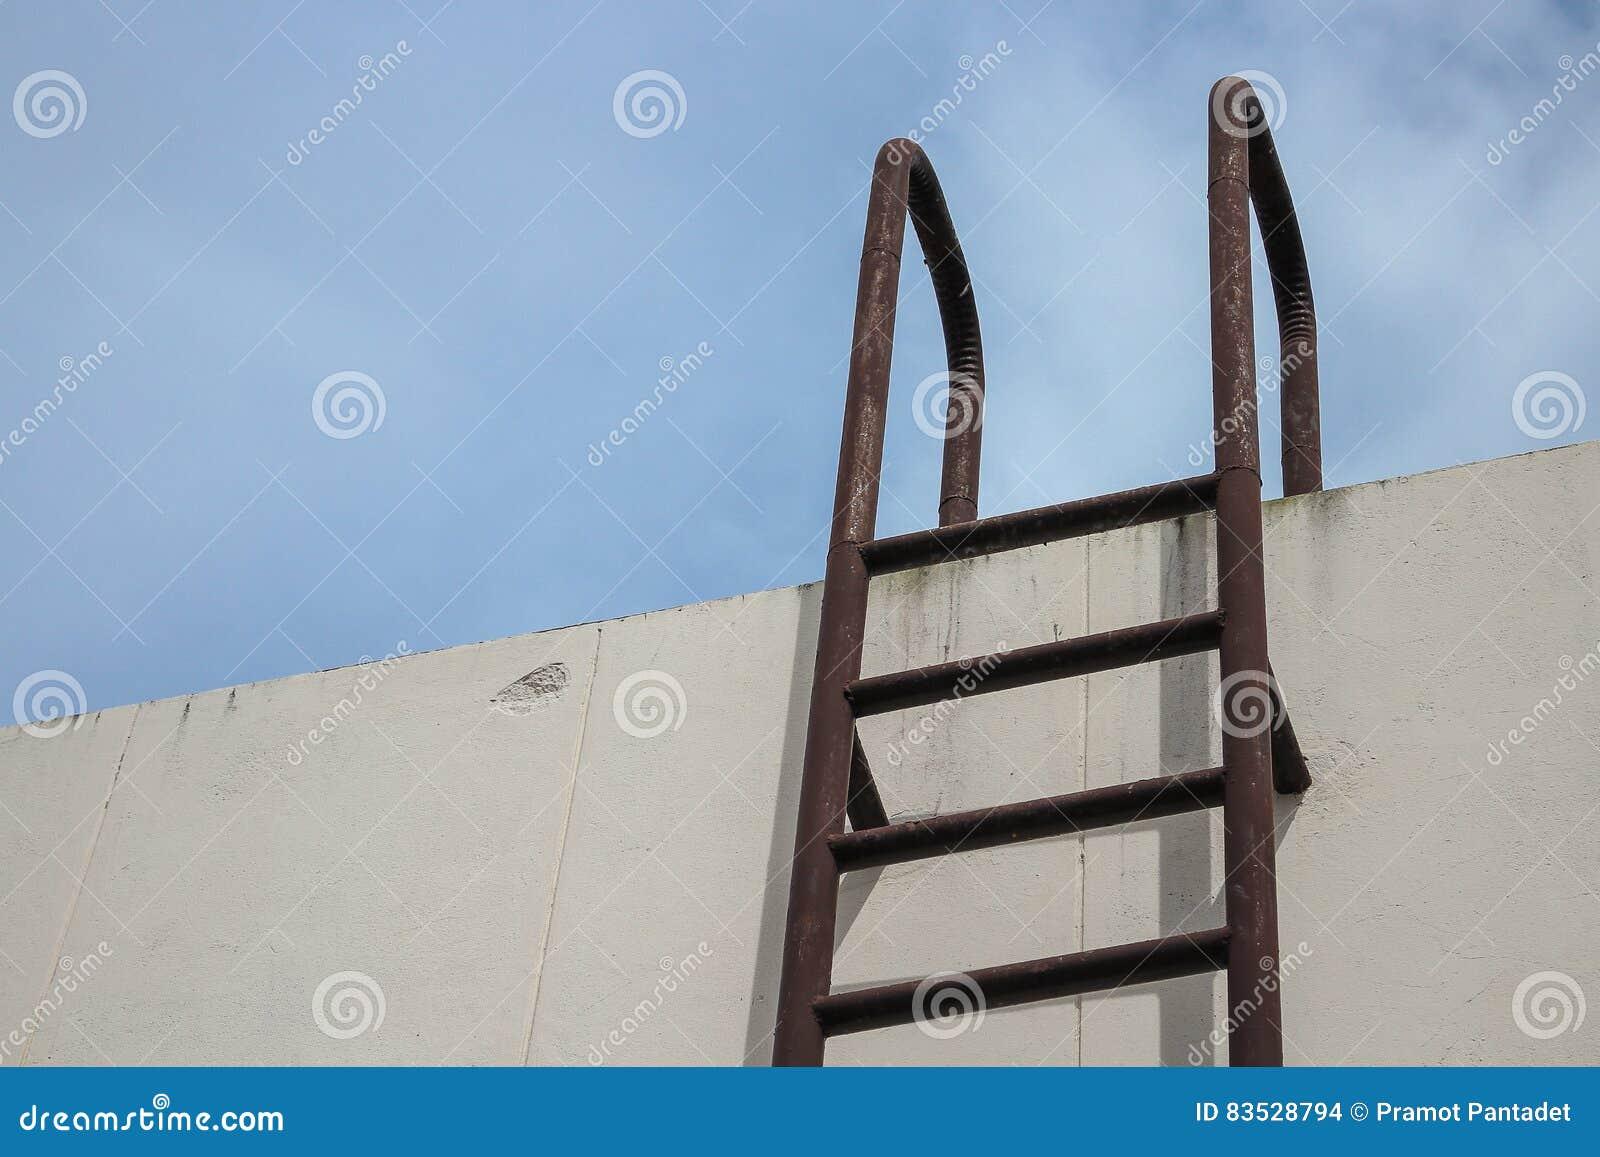 Water Tank Stairs : Old stair vertical industrial metal rusted to water tank